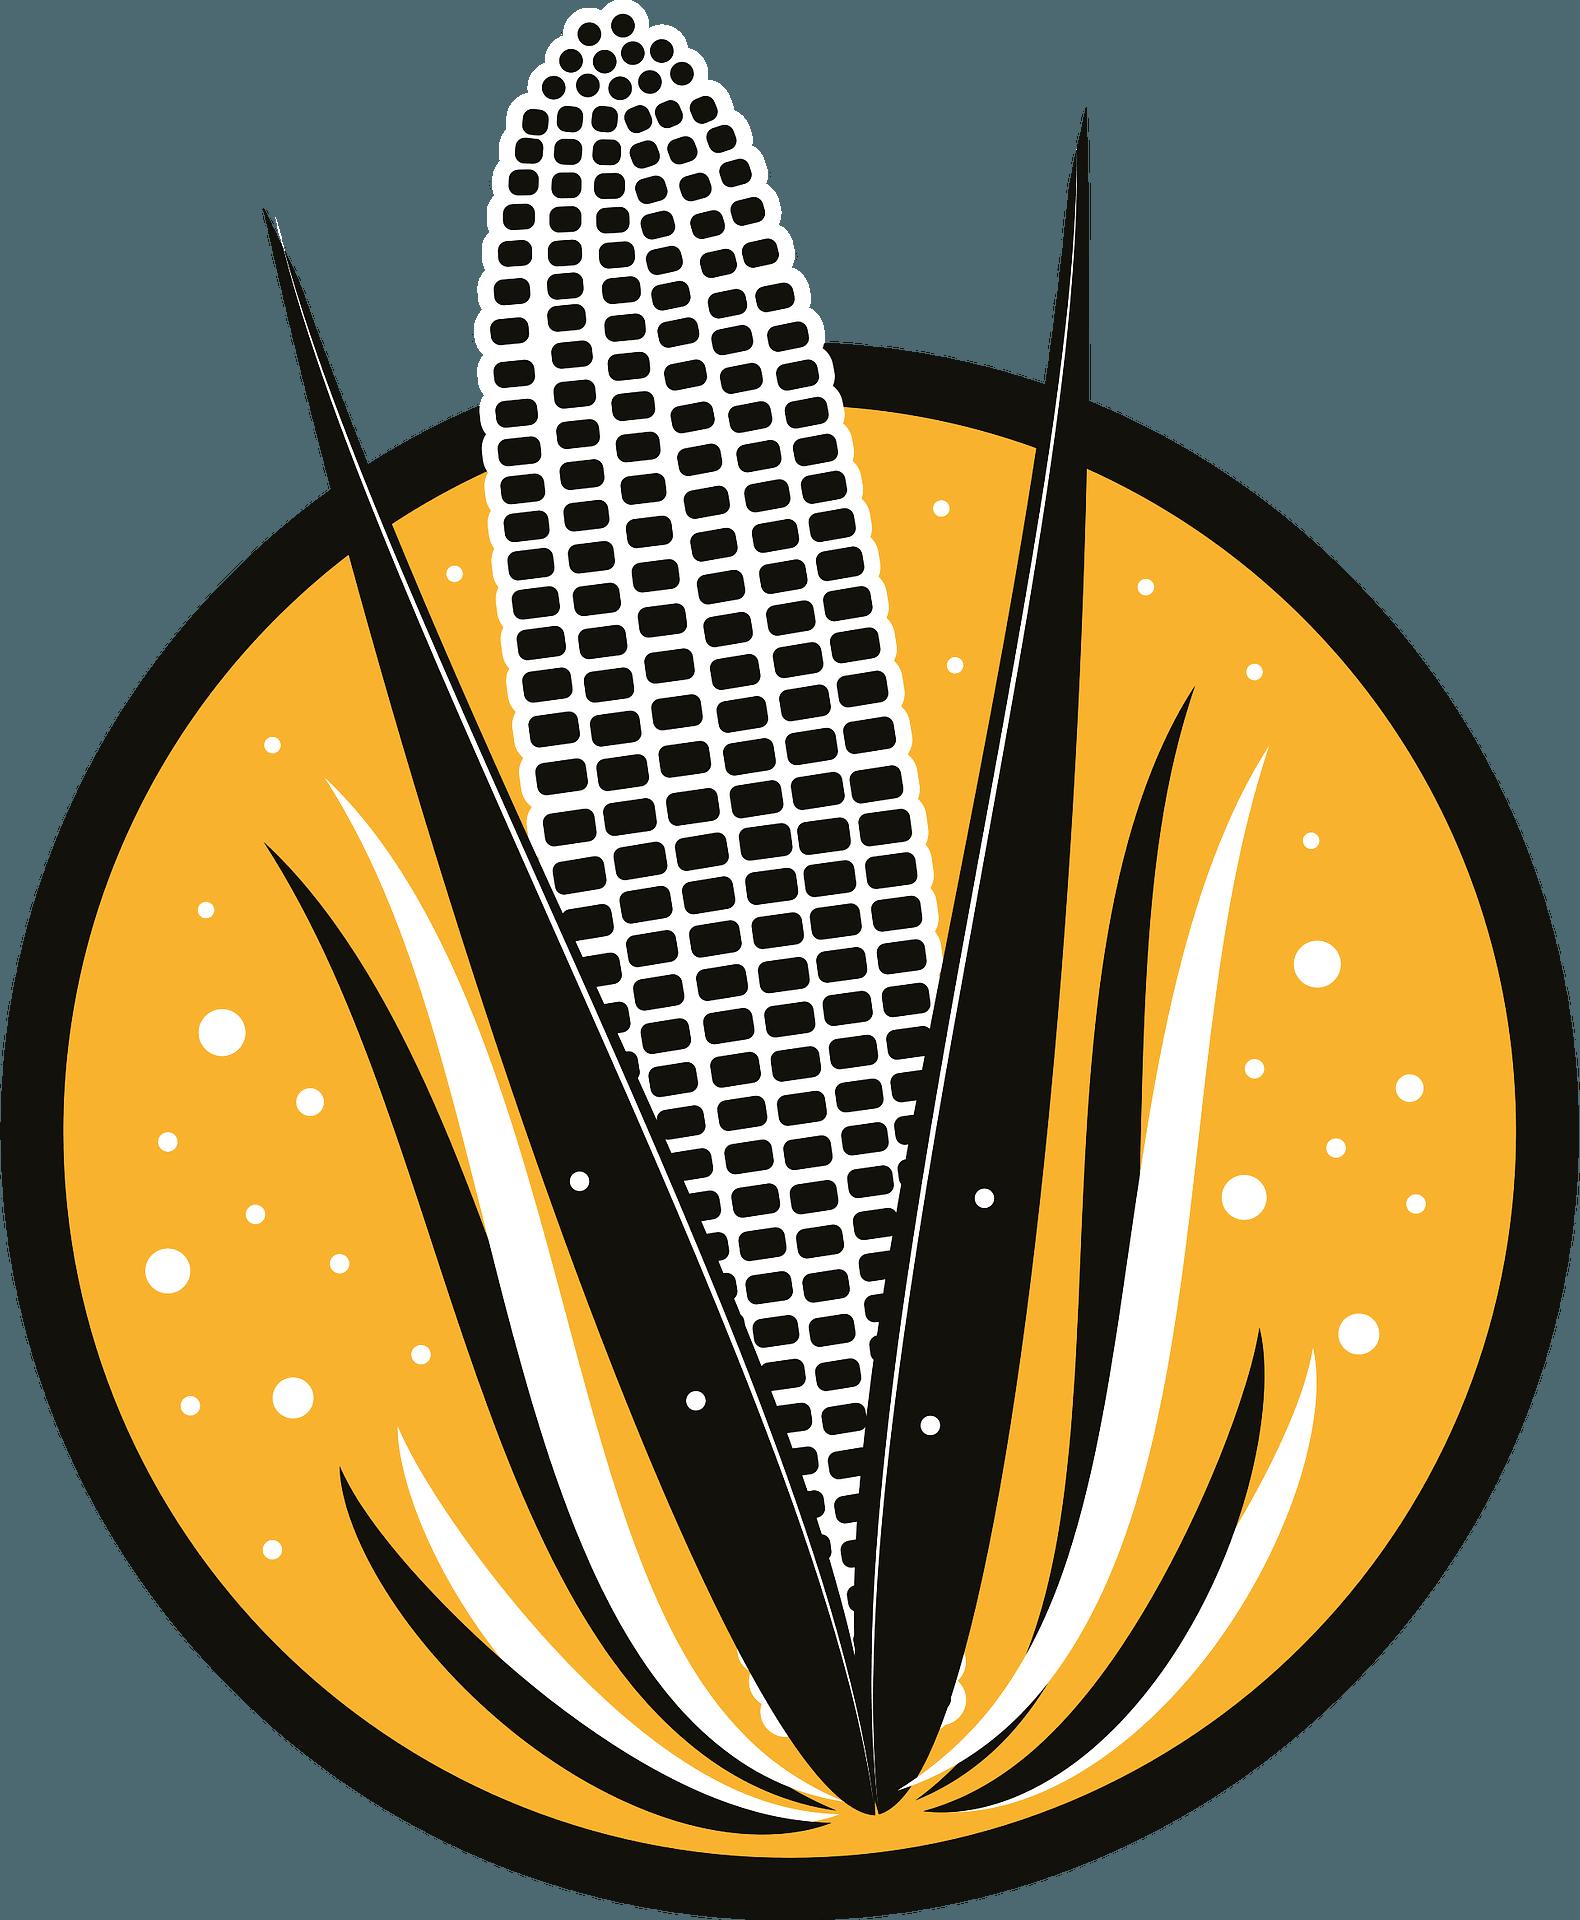 corn logo clipart free download transparent png creazilla corn logo clipart free download